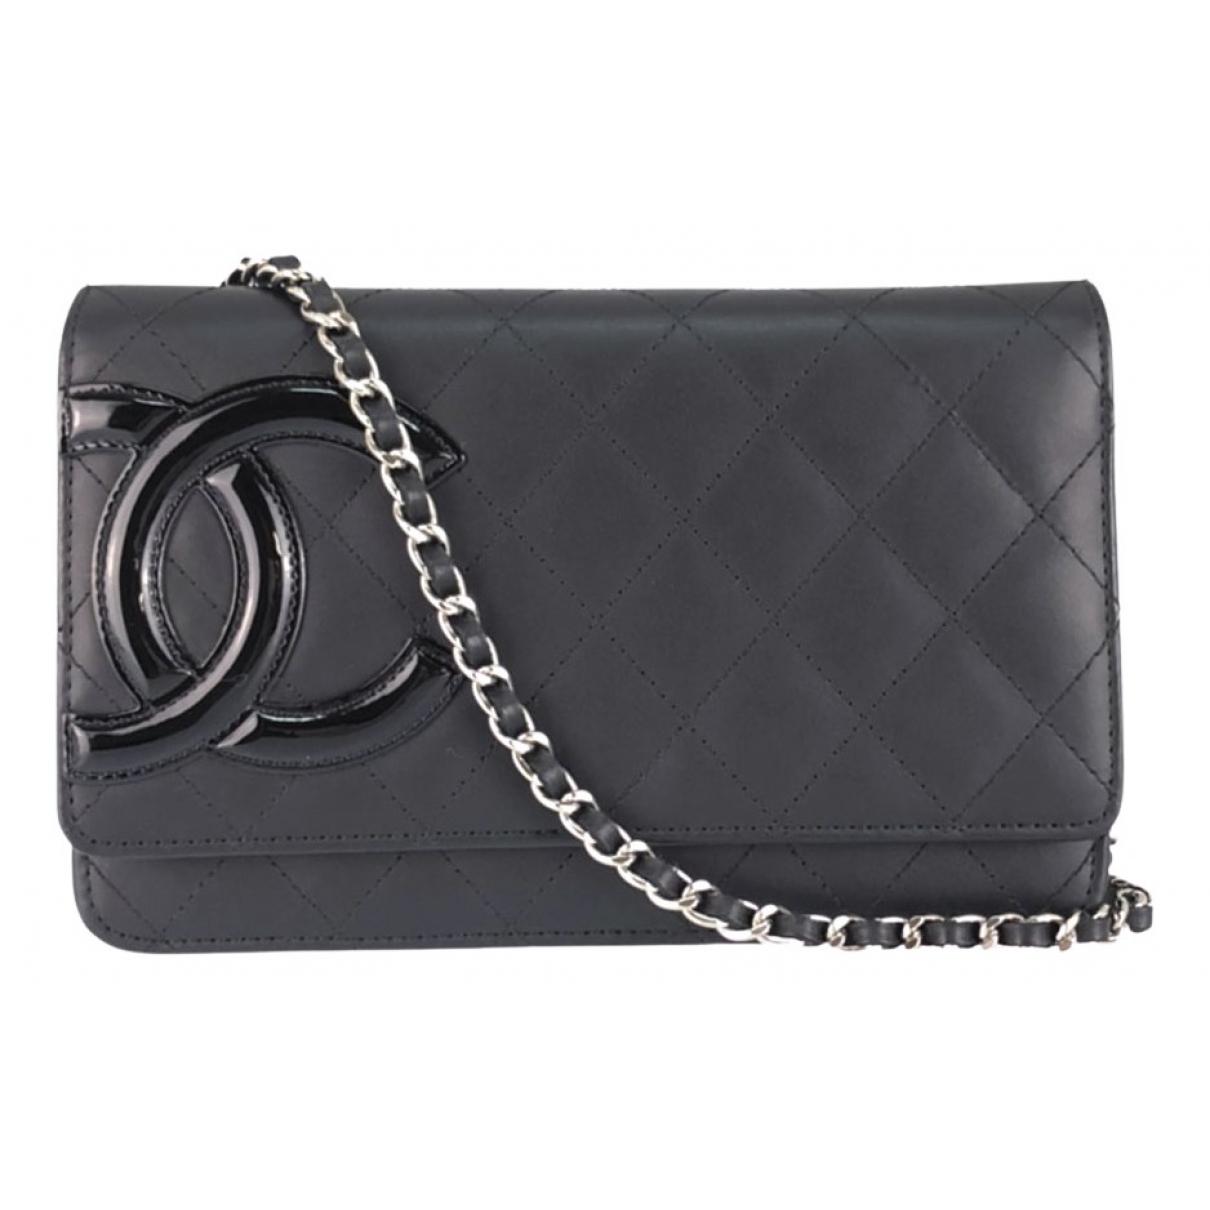 Chanel Wallet on Chain Clutch in  Schwarz Leder